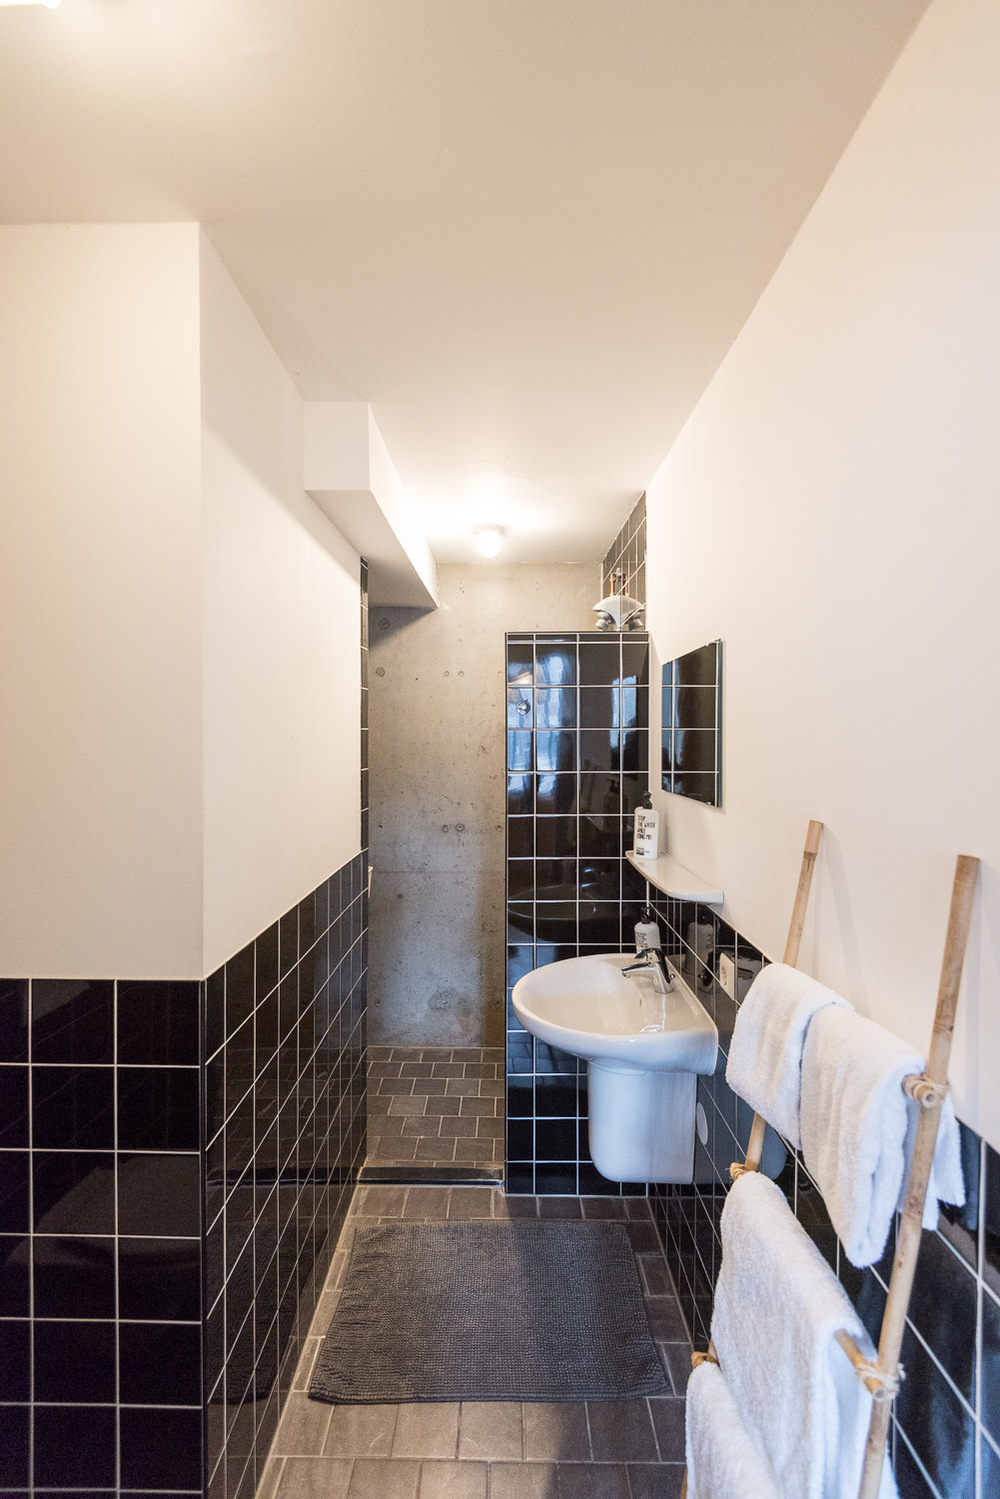 Bathroom 2 at Ecomama Hotel